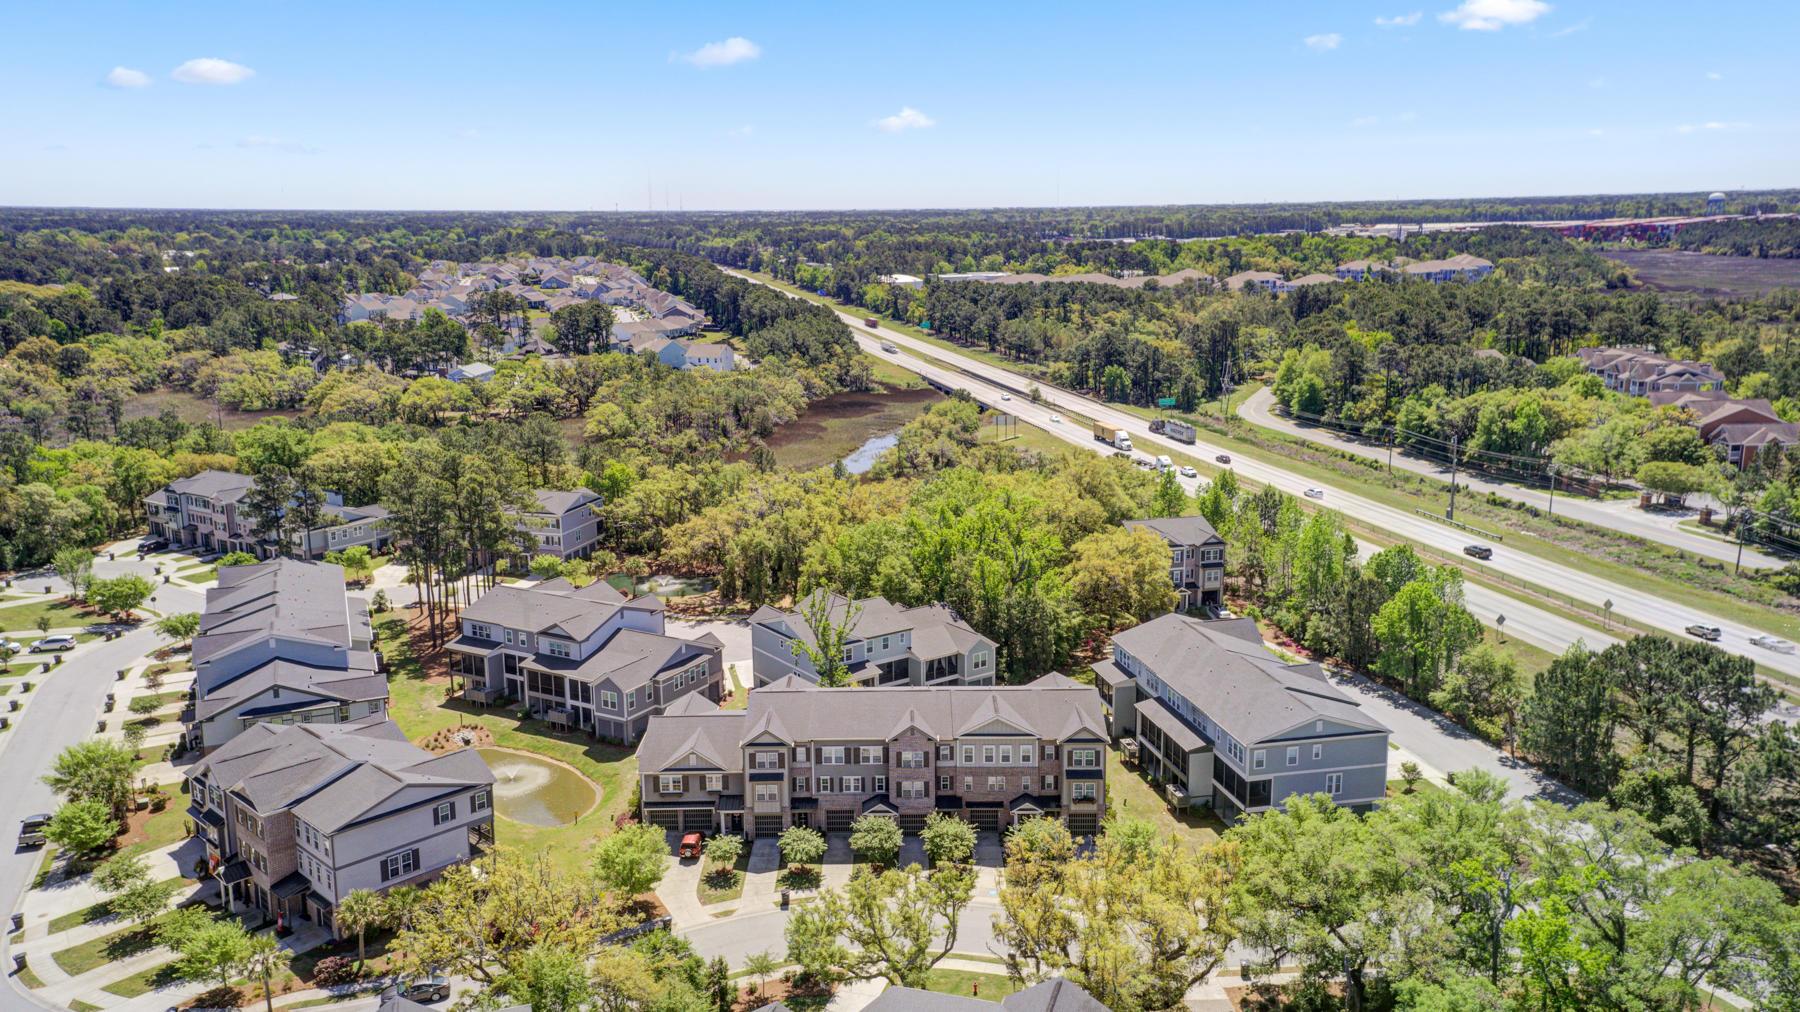 Etiwan Pointe Homes For Sale - 254 Slipper Shell, Mount Pleasant, SC - 24